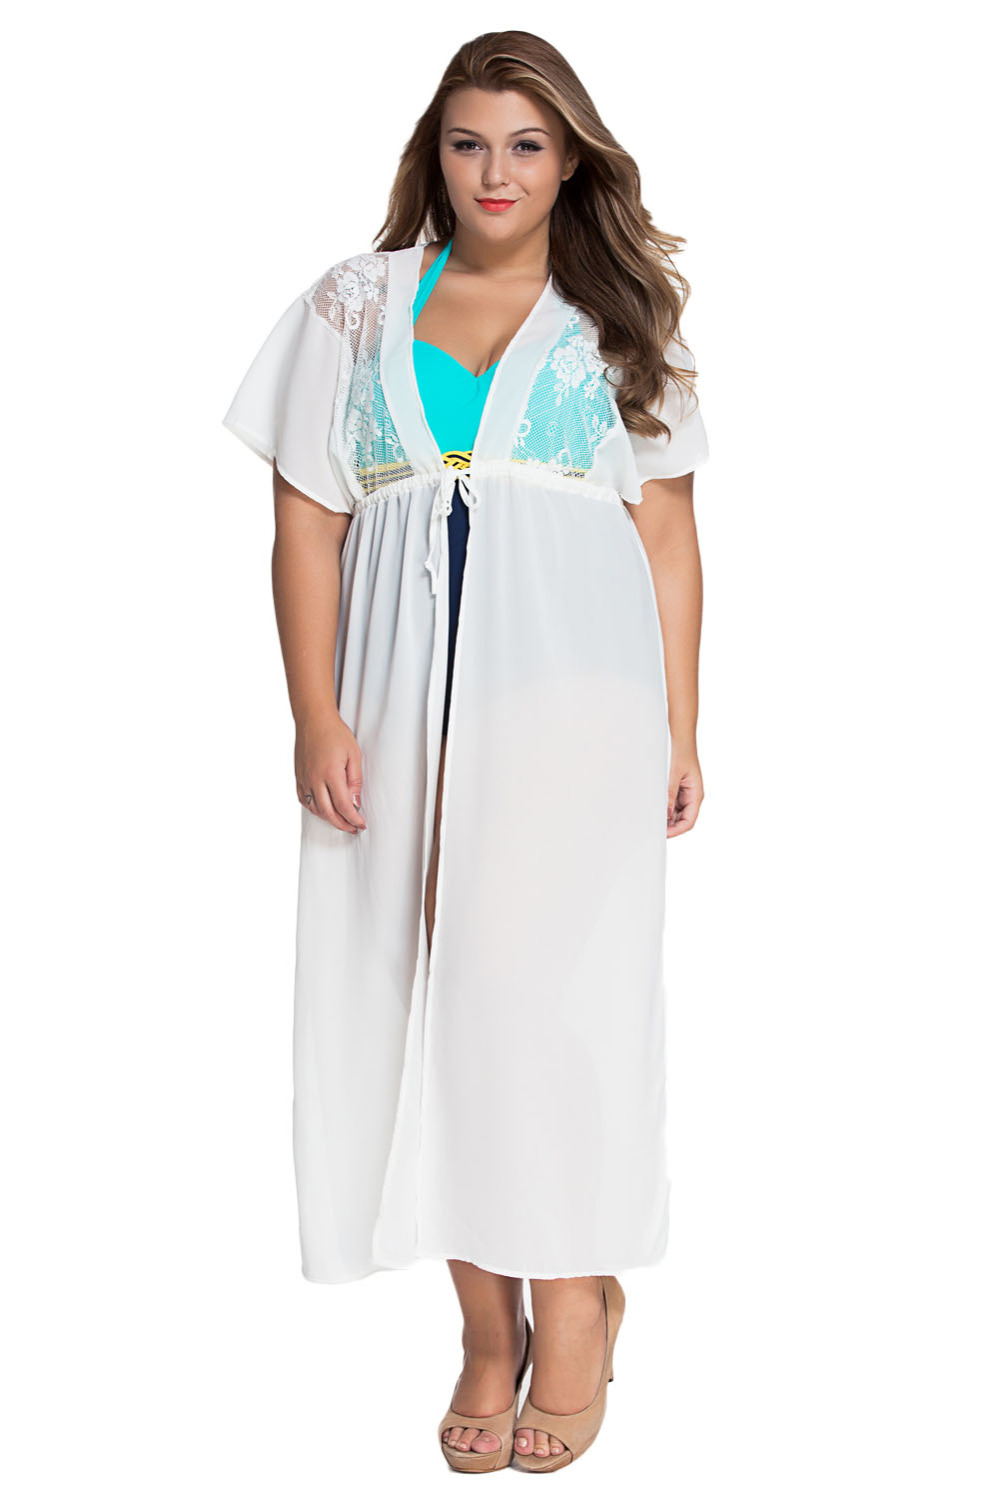 06a12e241131b Aliexpress.com : Buy Women White Swimwear Bikini Beach Cover Up Pareo Beach  Kaftan Sexy Bathing Suit Cover Ups Swimsuit Coverups Beach Wear from  Reliable ...